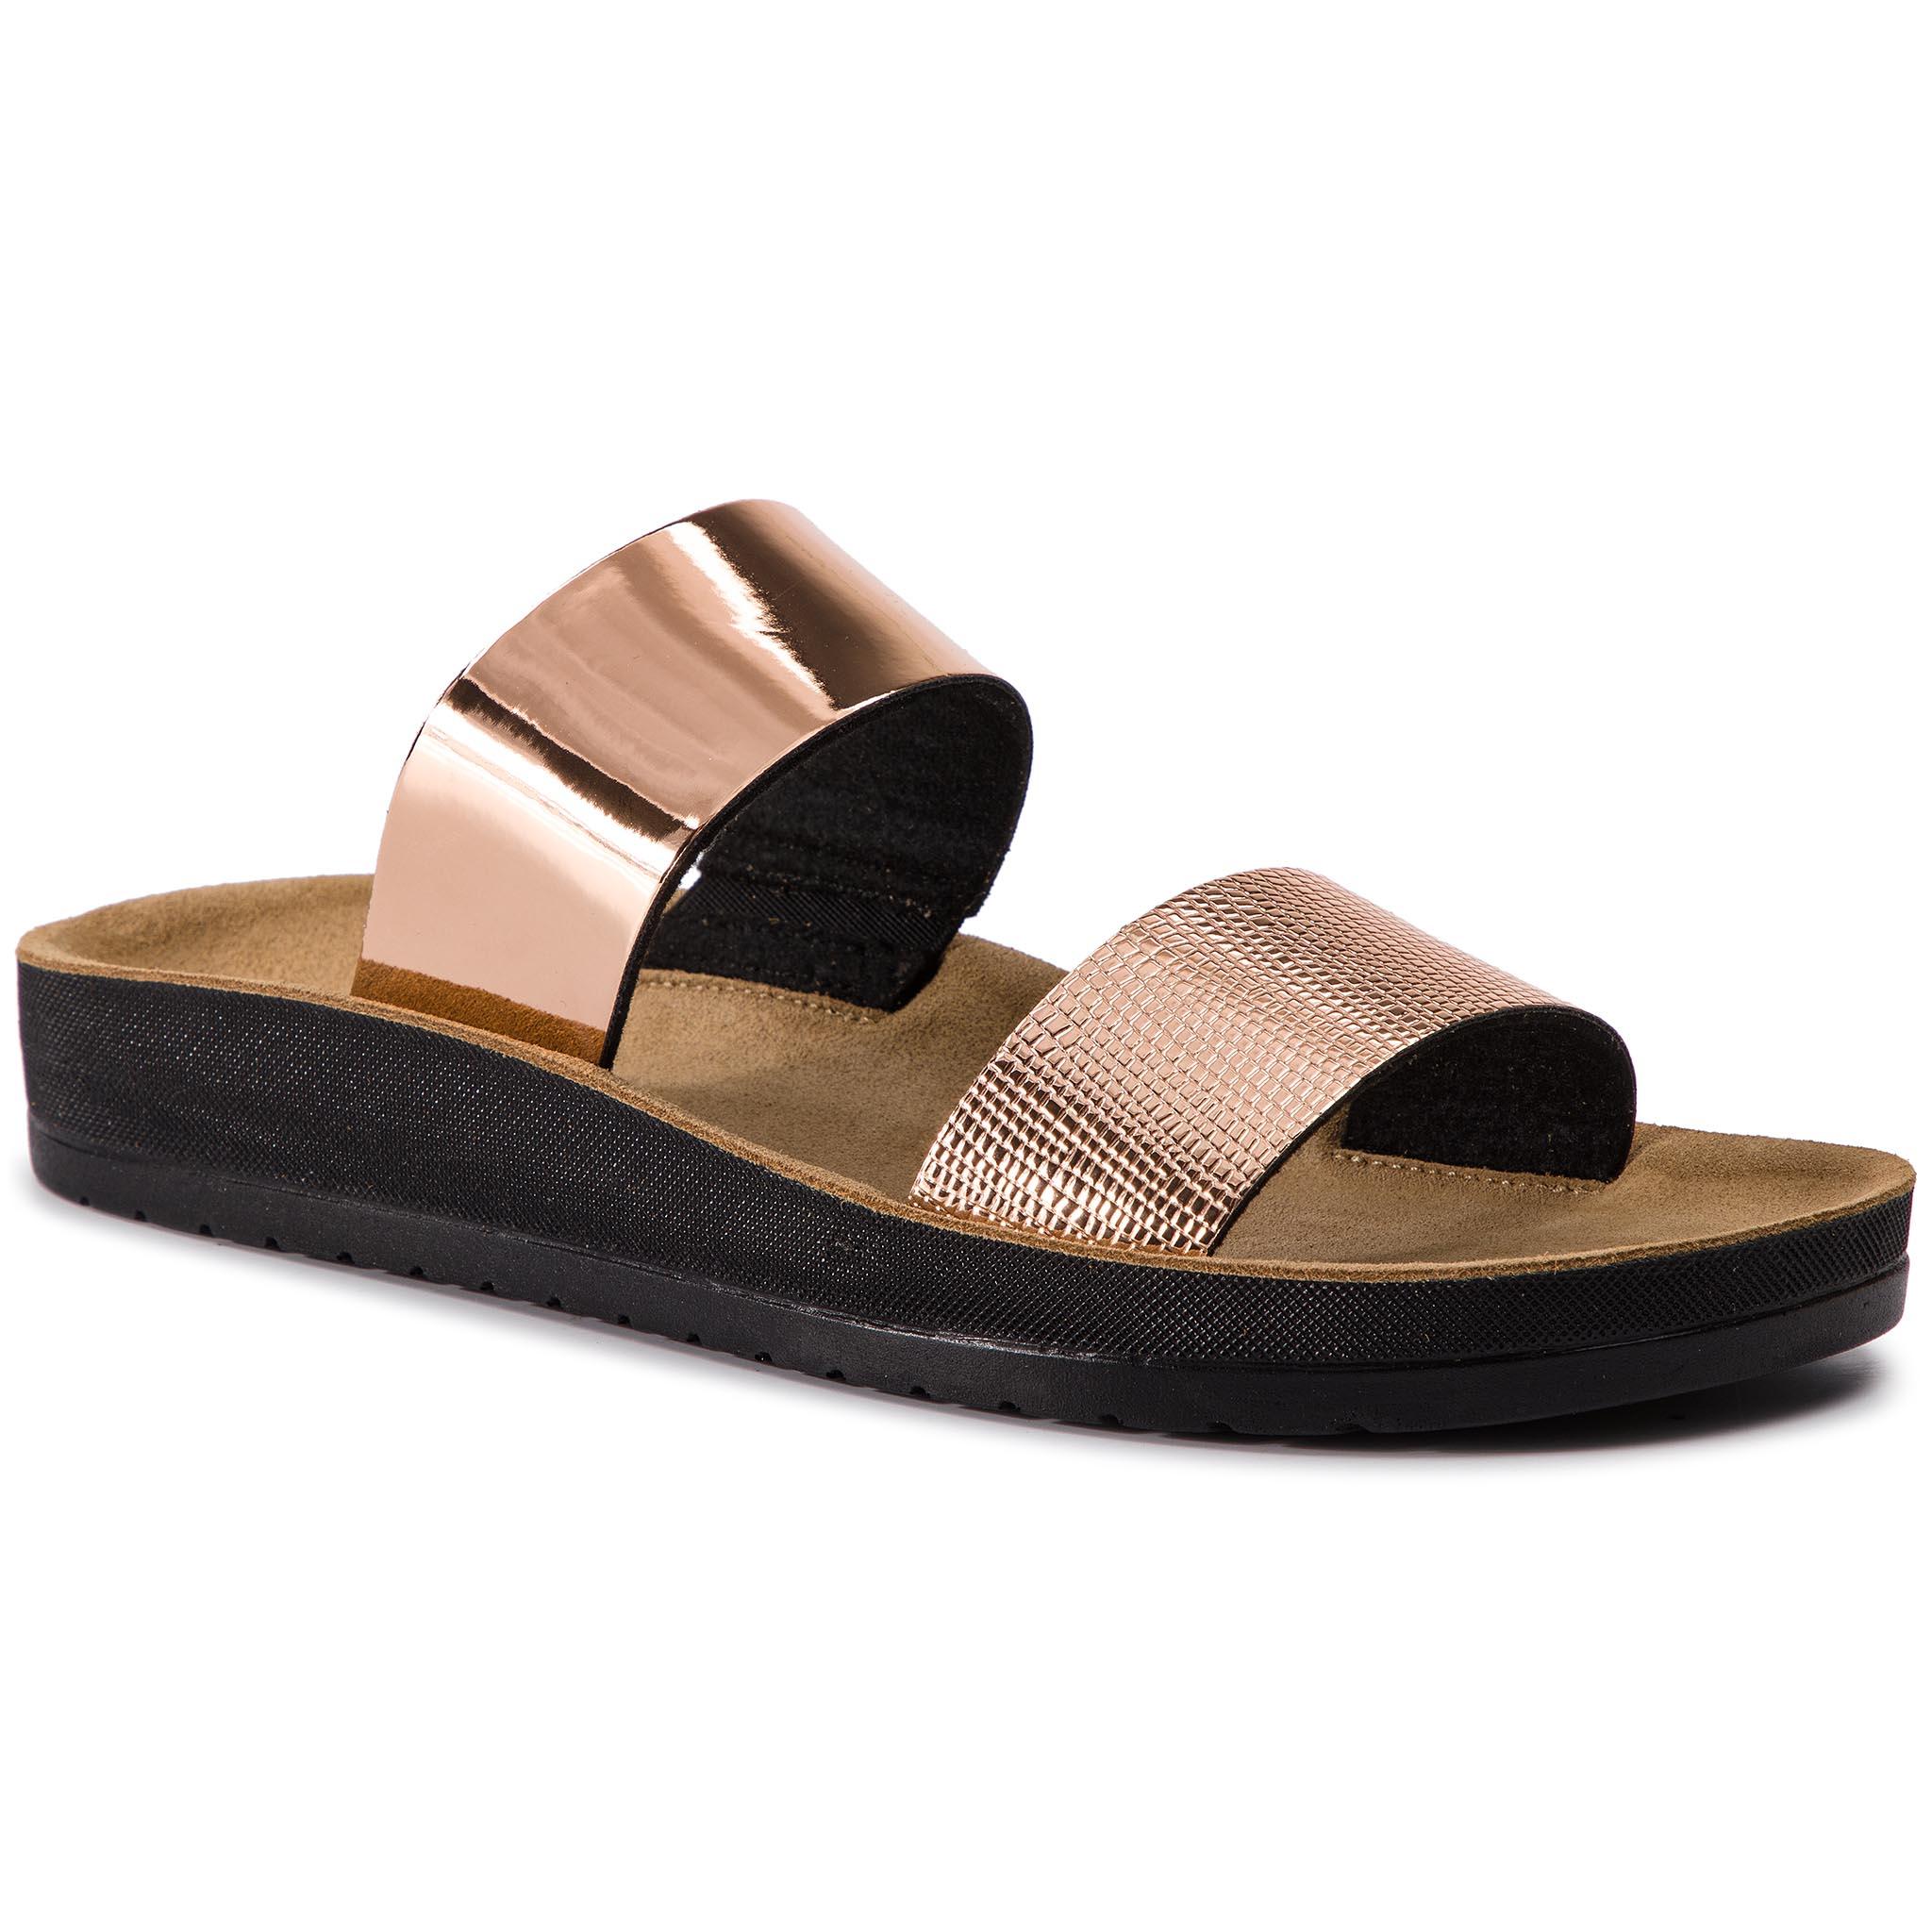 Scholl, Aranyszínű Női cipők GLAMI.hu